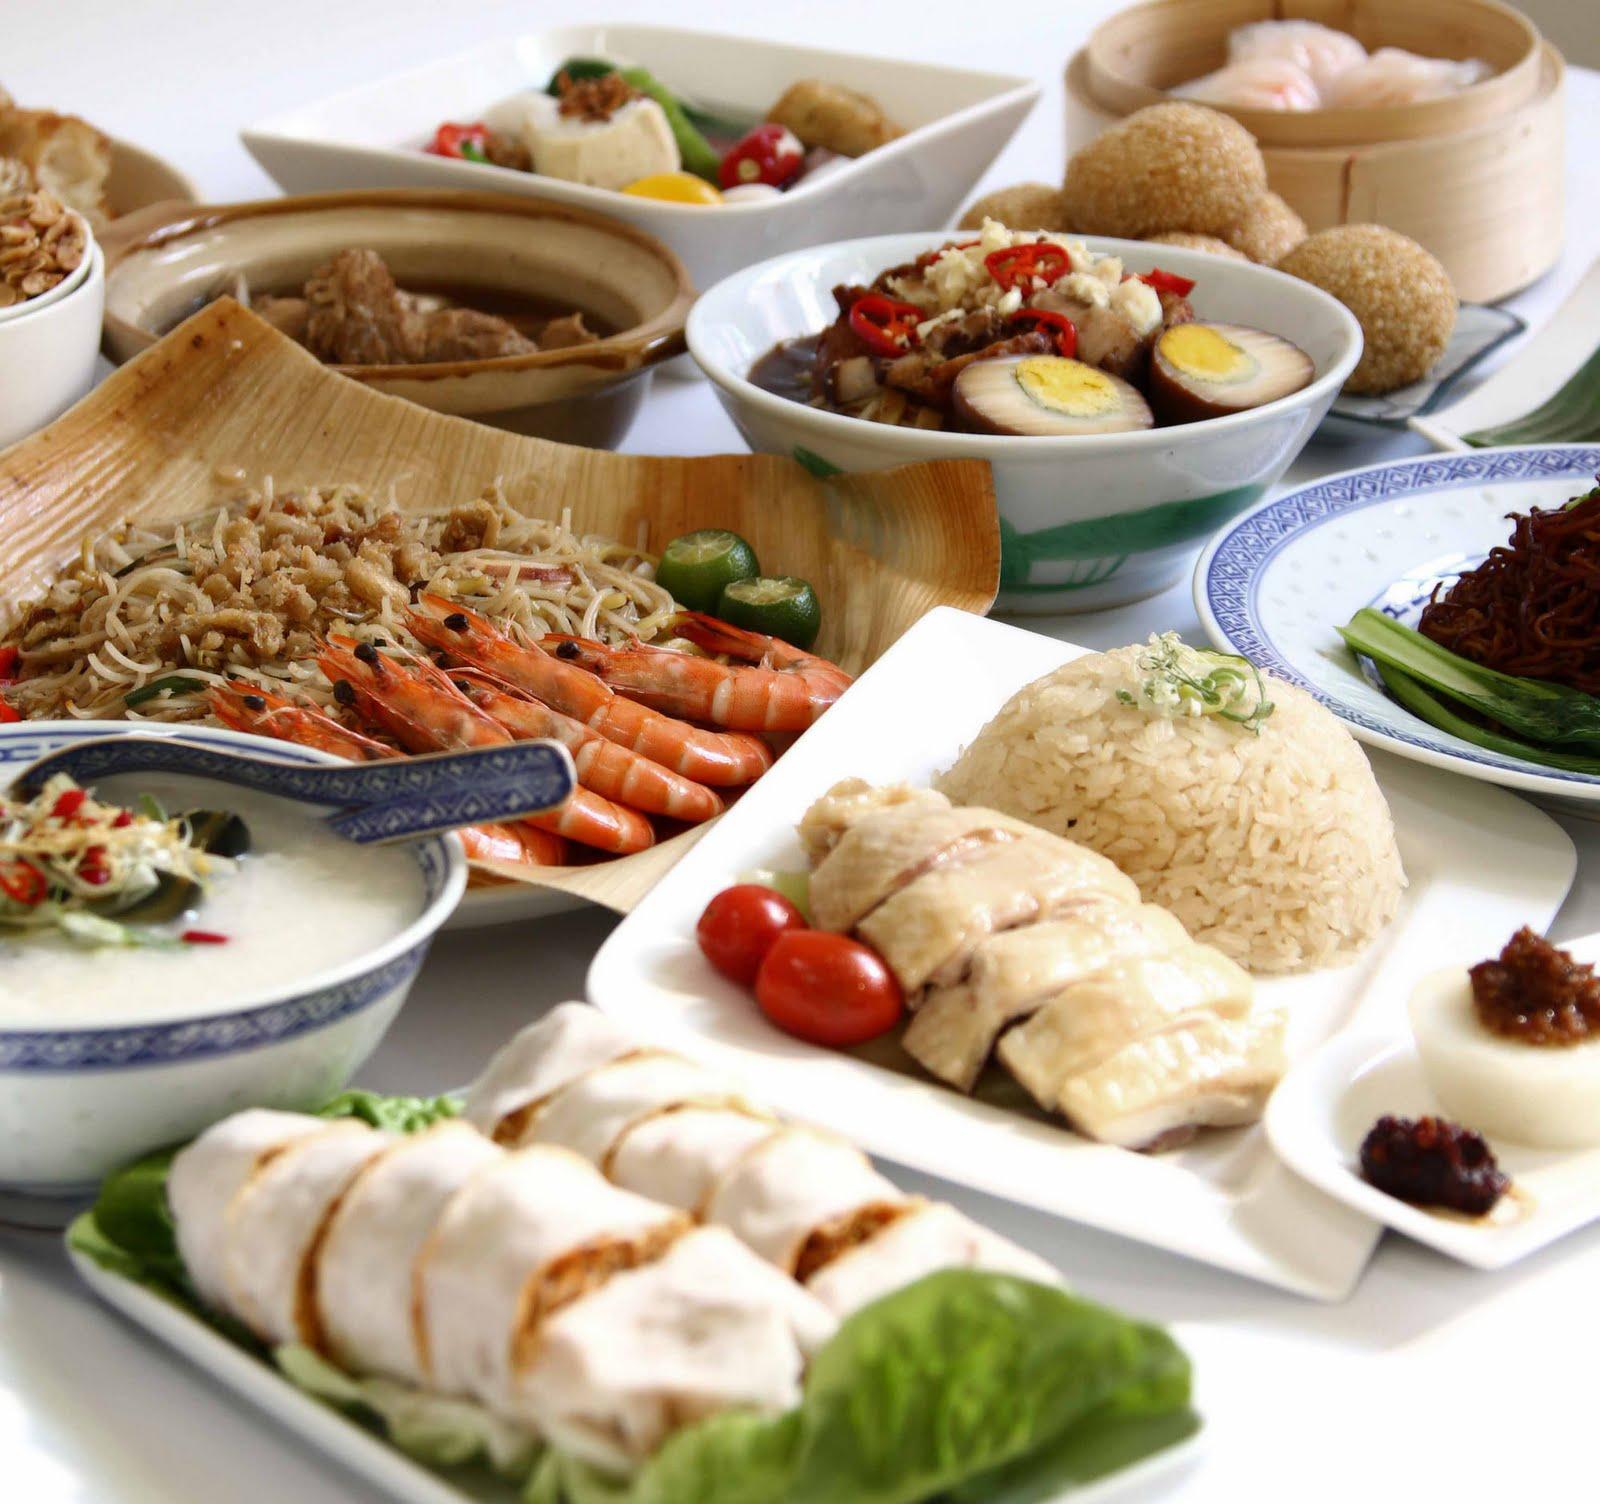 Our Taste of Life: SINGAPORE FOOD FESTIVAL 2010 ...